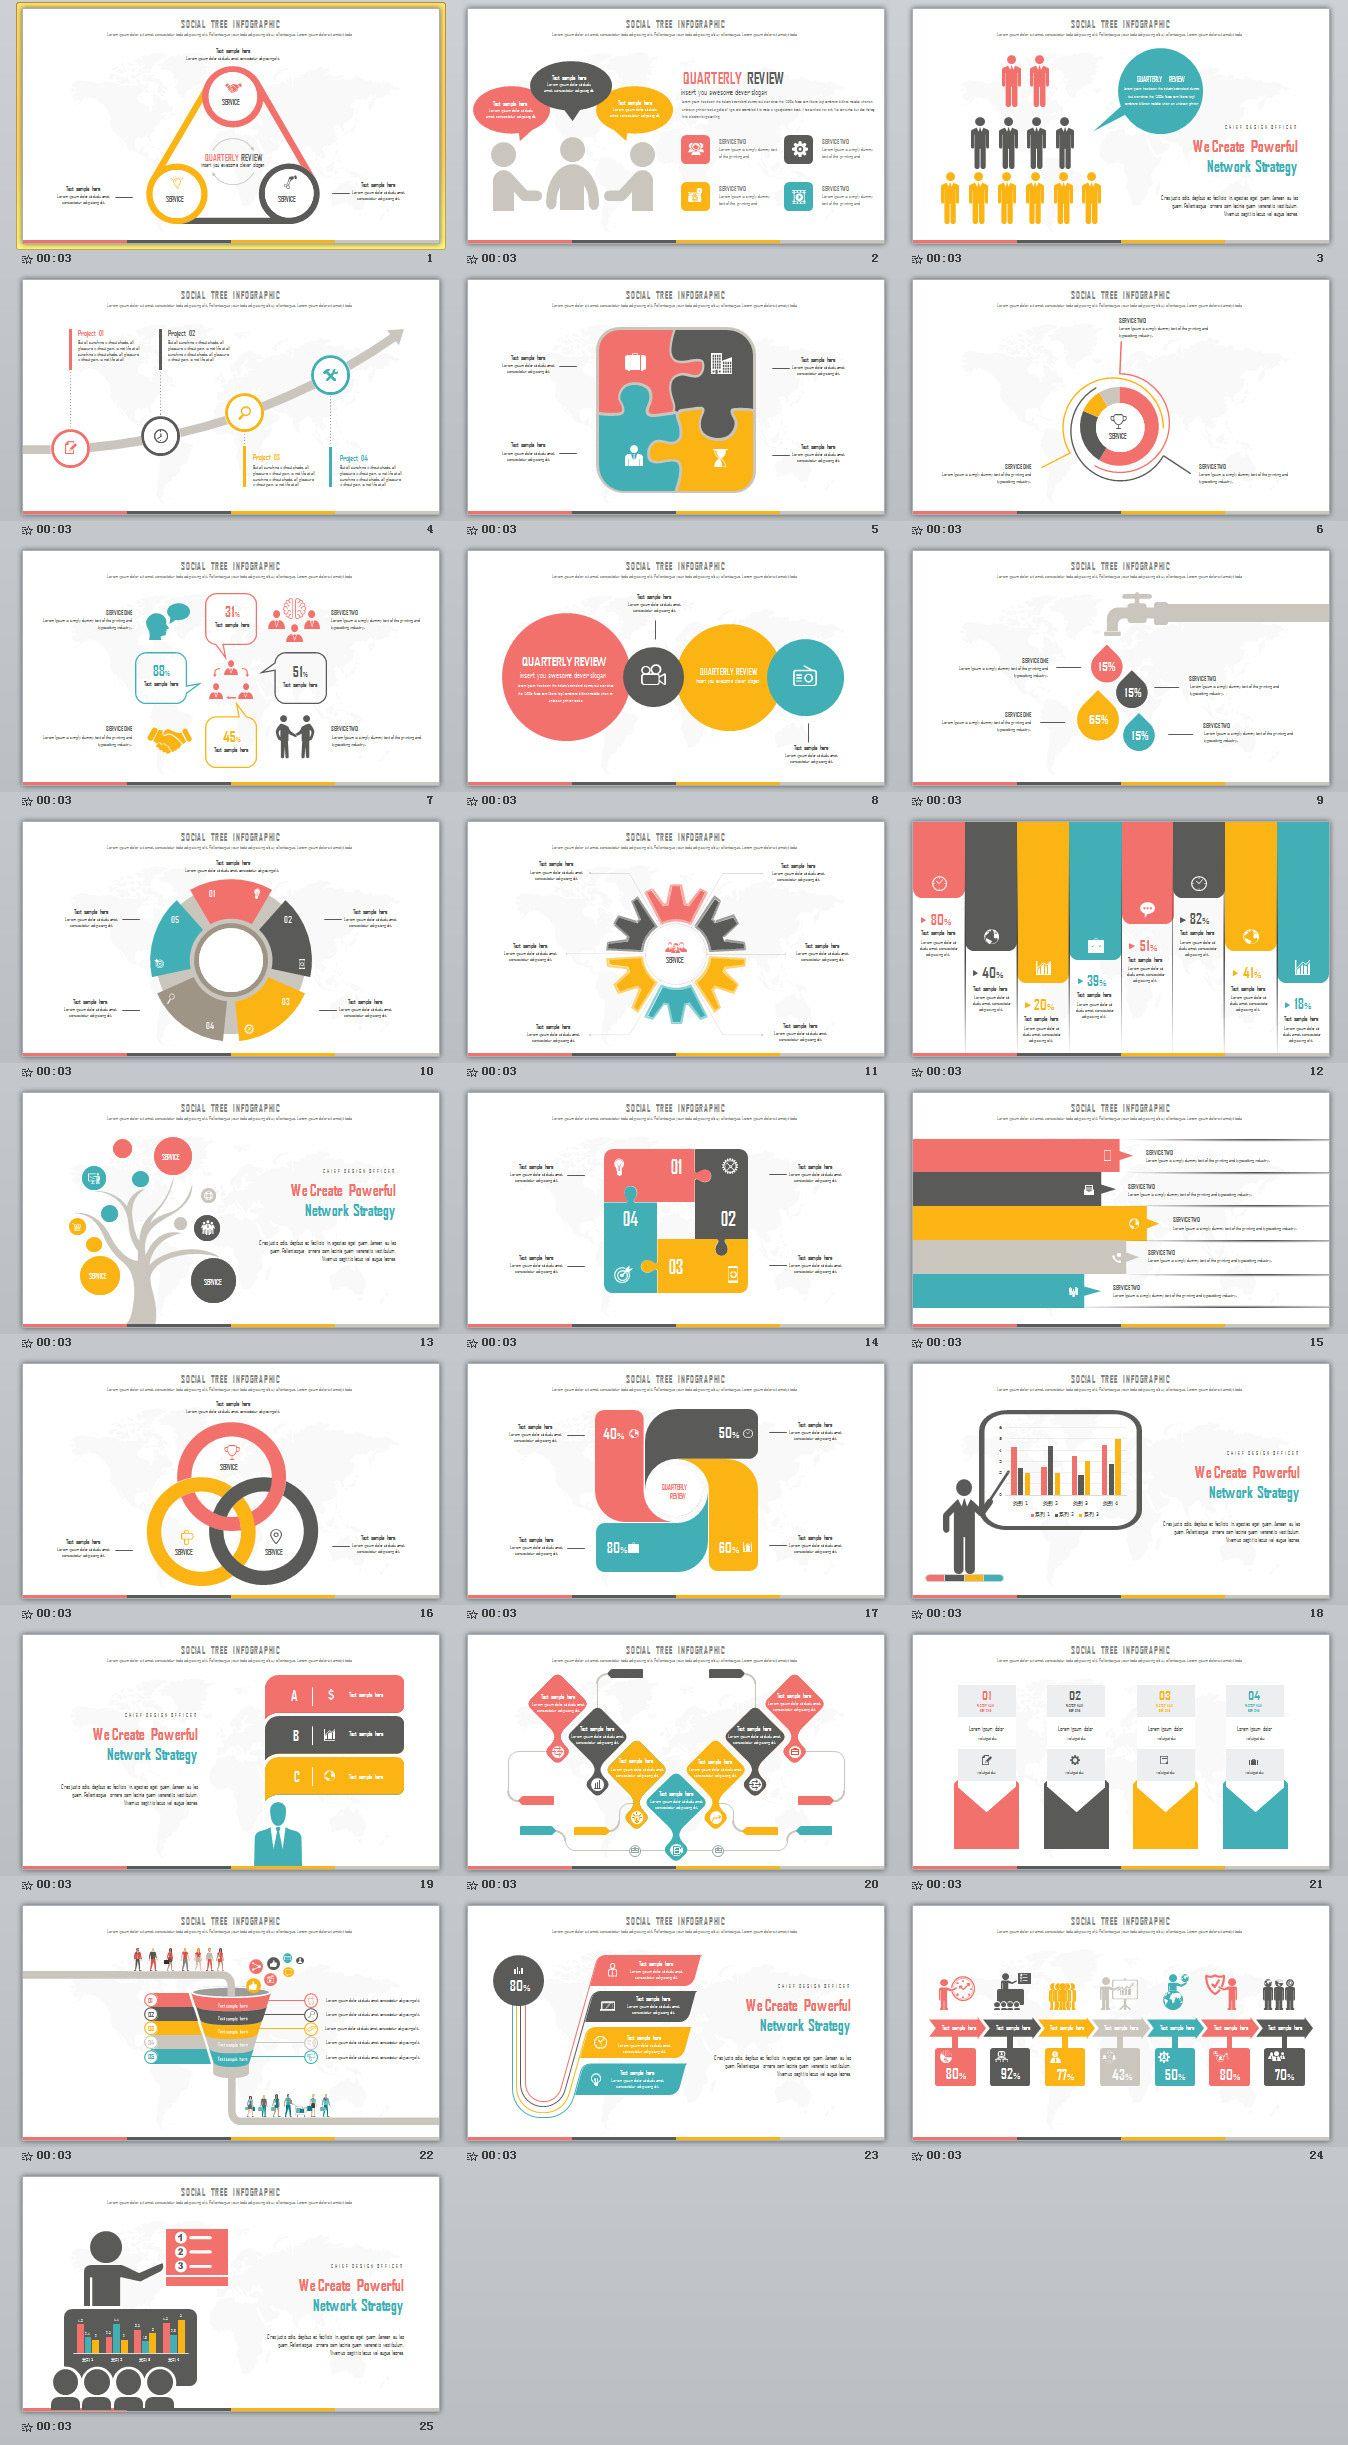 25 infographics slides powerpoint template on behance powerpoint 25 infographics slides powerpoint template on behance powerpoint templates presentation animation toneelgroepblik Choice Image